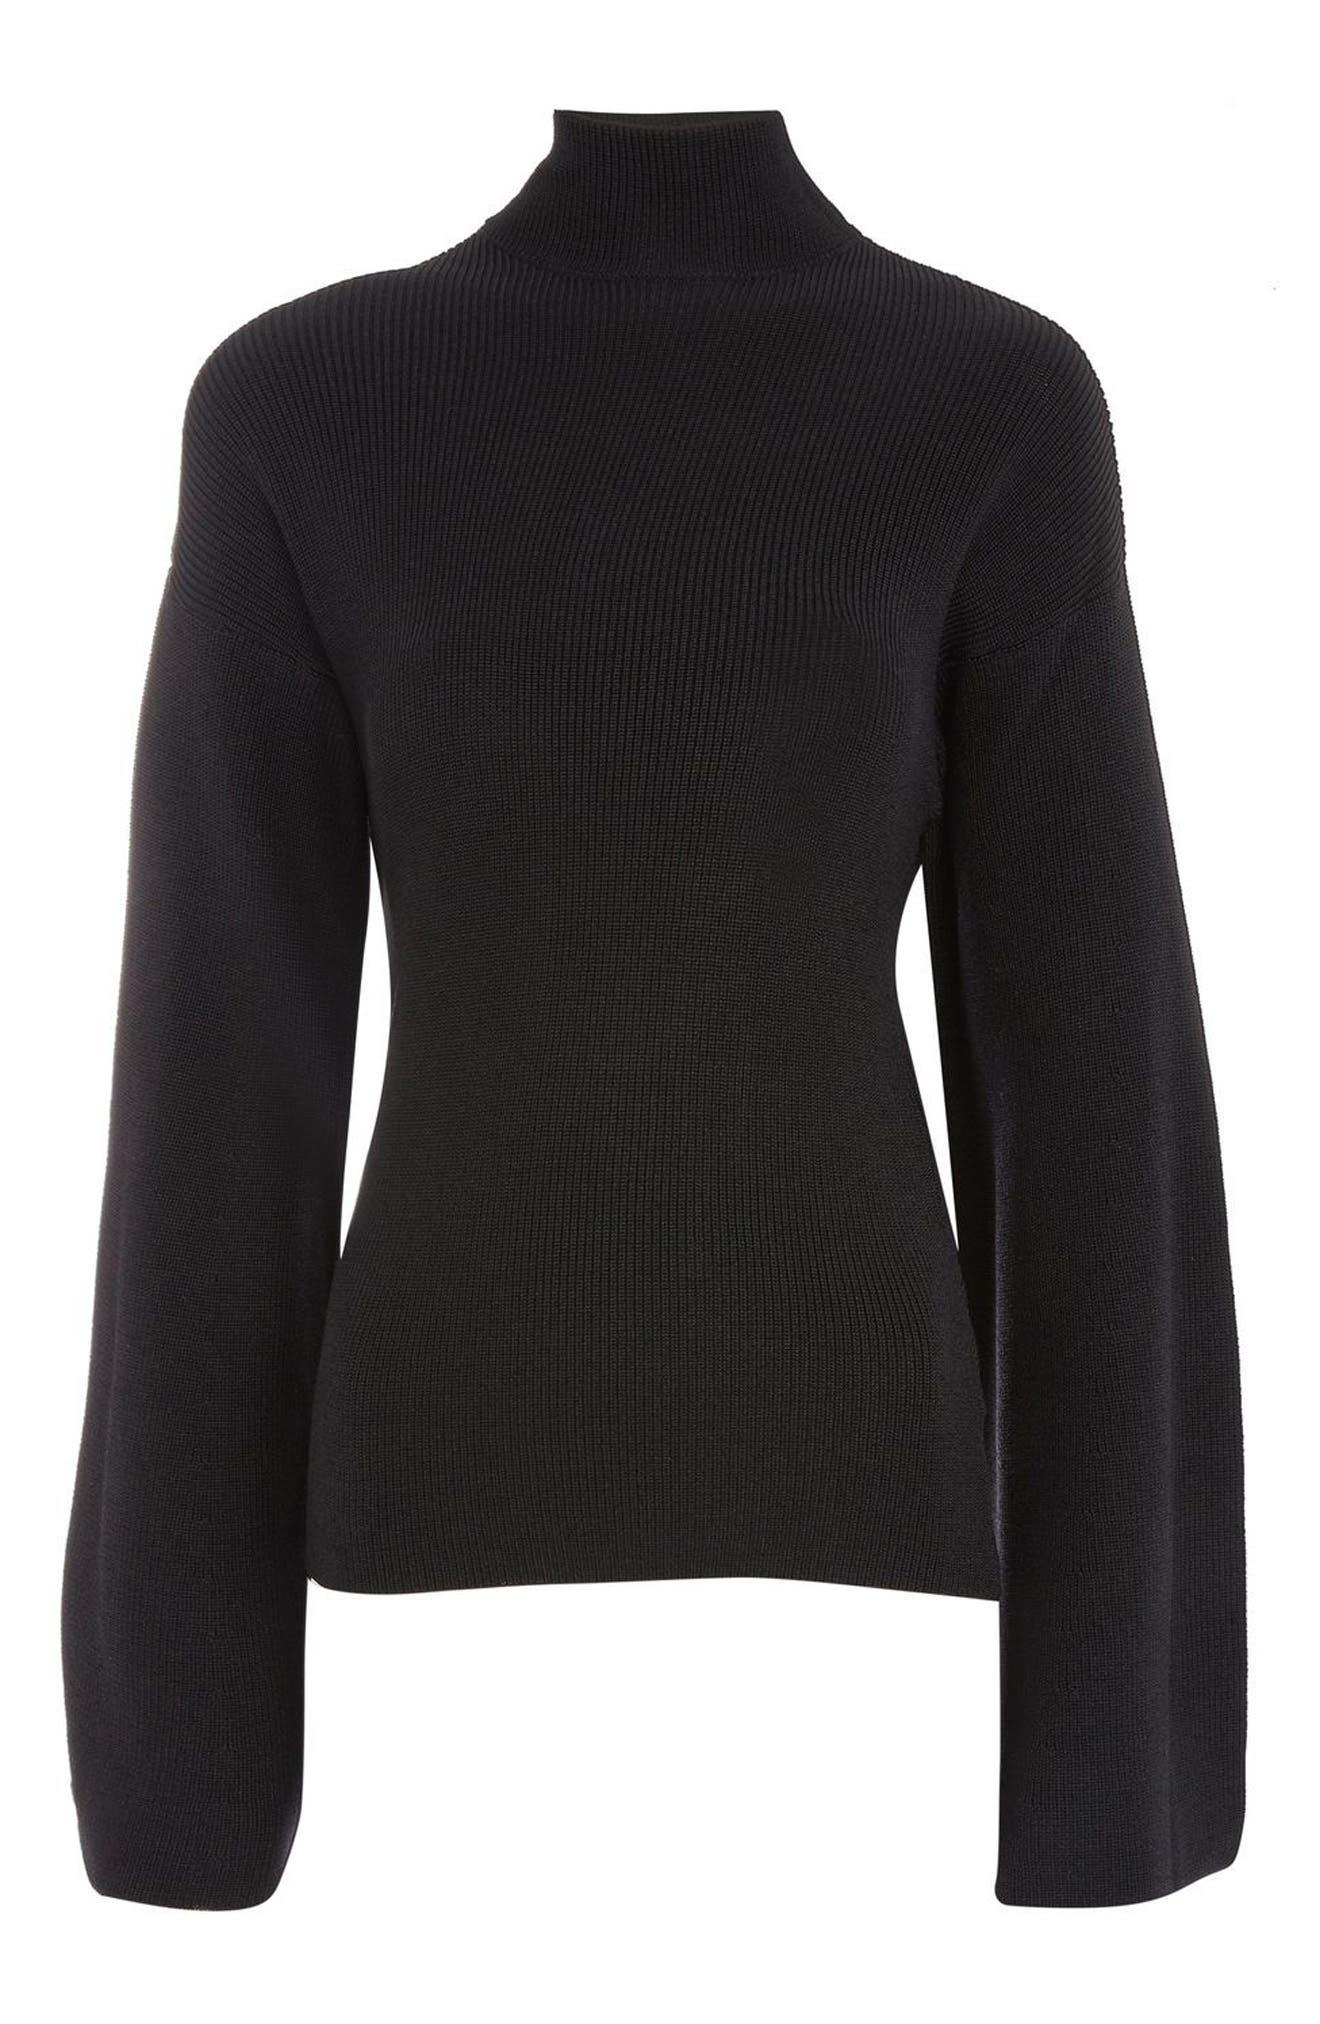 Topshop Boutique Twist Back Sweater